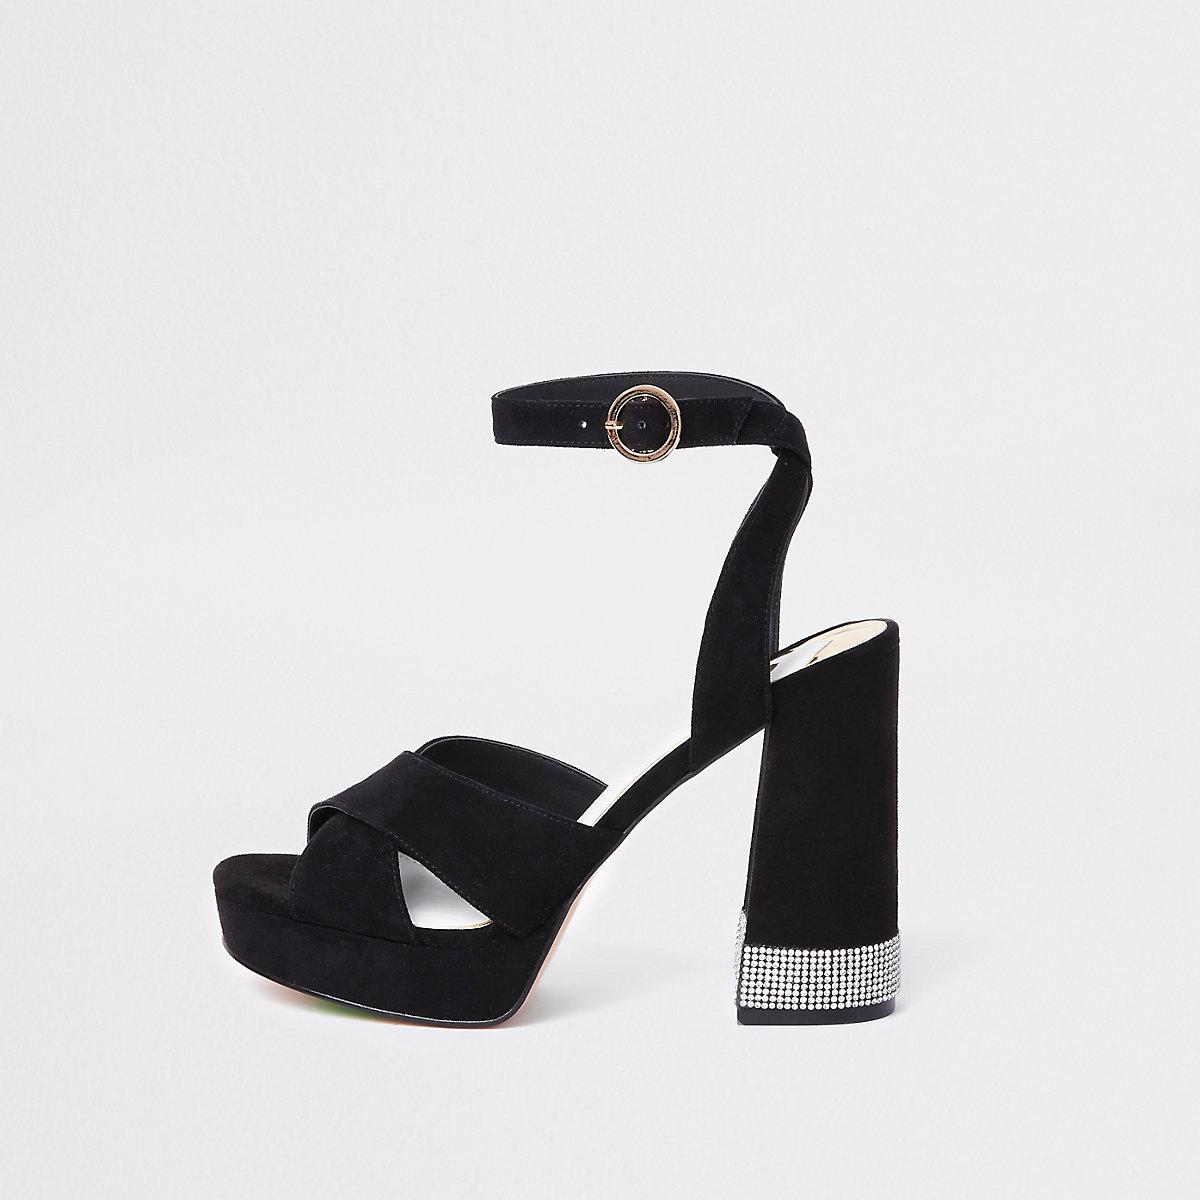 Black heatseal rhinestone platform sandals